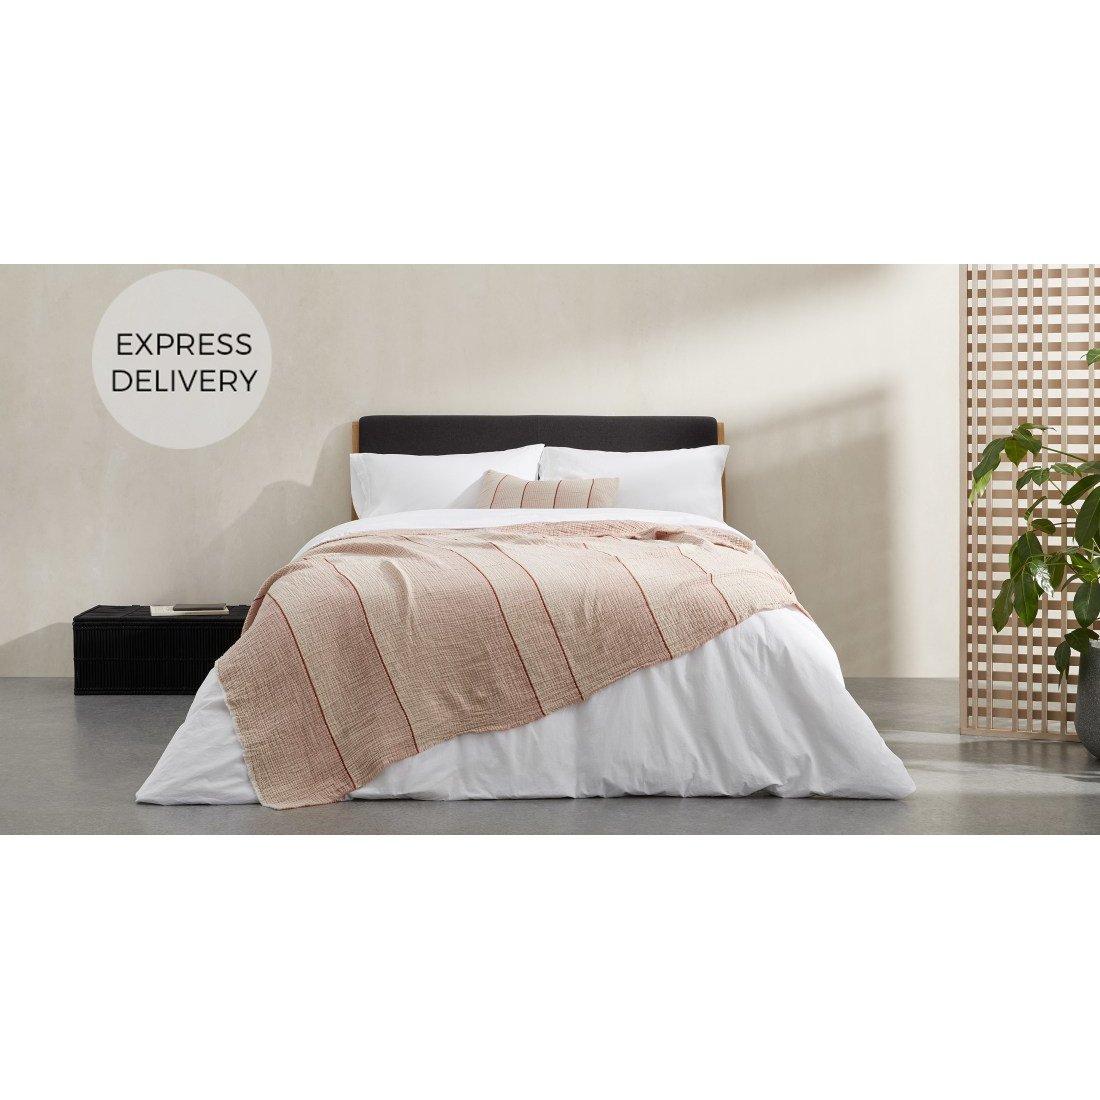 image-Tallis Organic Cotton Bed Throw 150 x 200cm, Terracotta